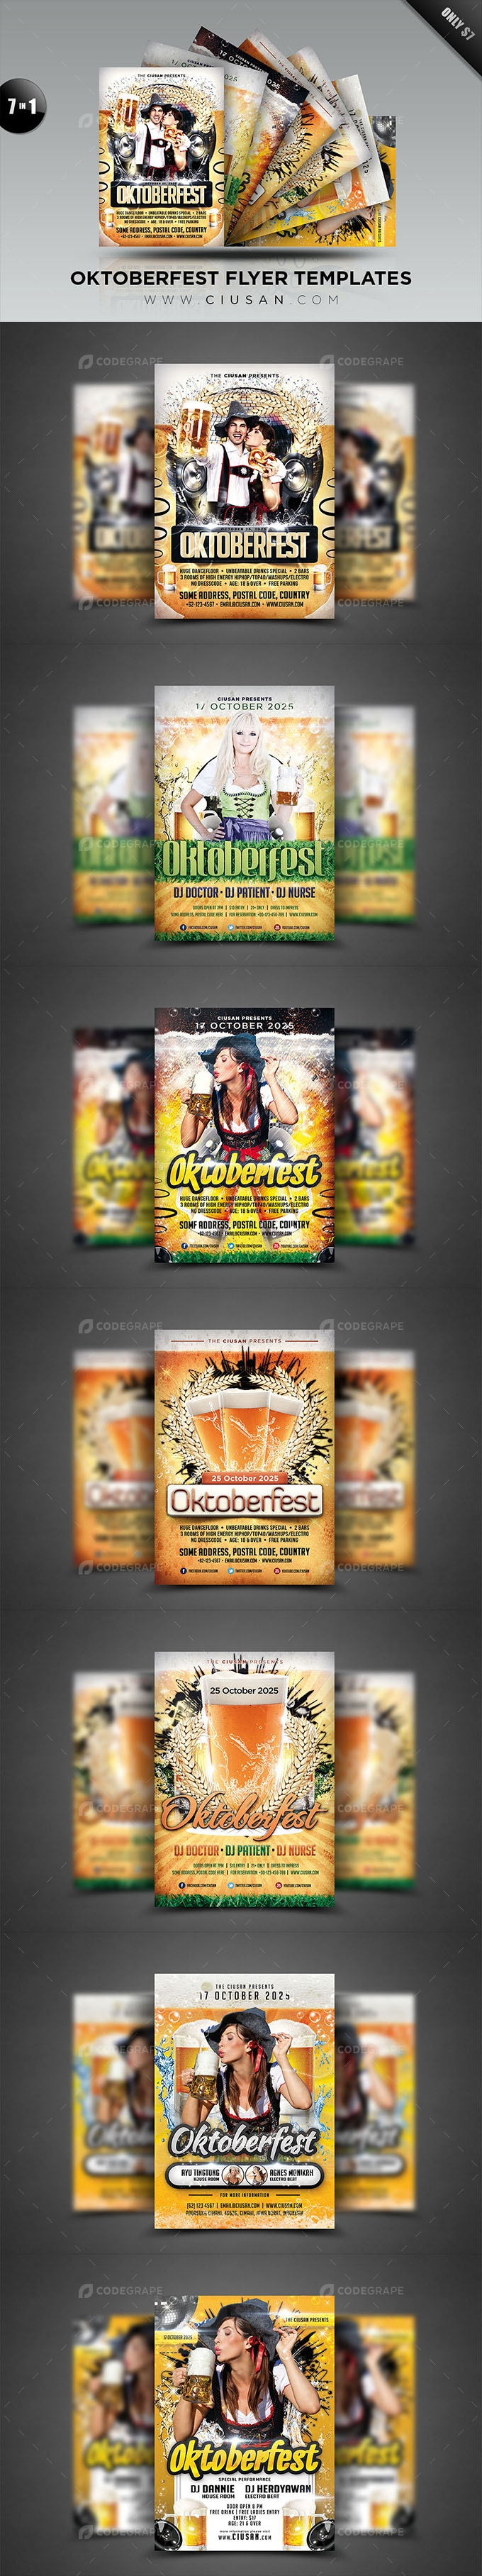 Oktoberfest Flyer Template Bundle (7 in 1)